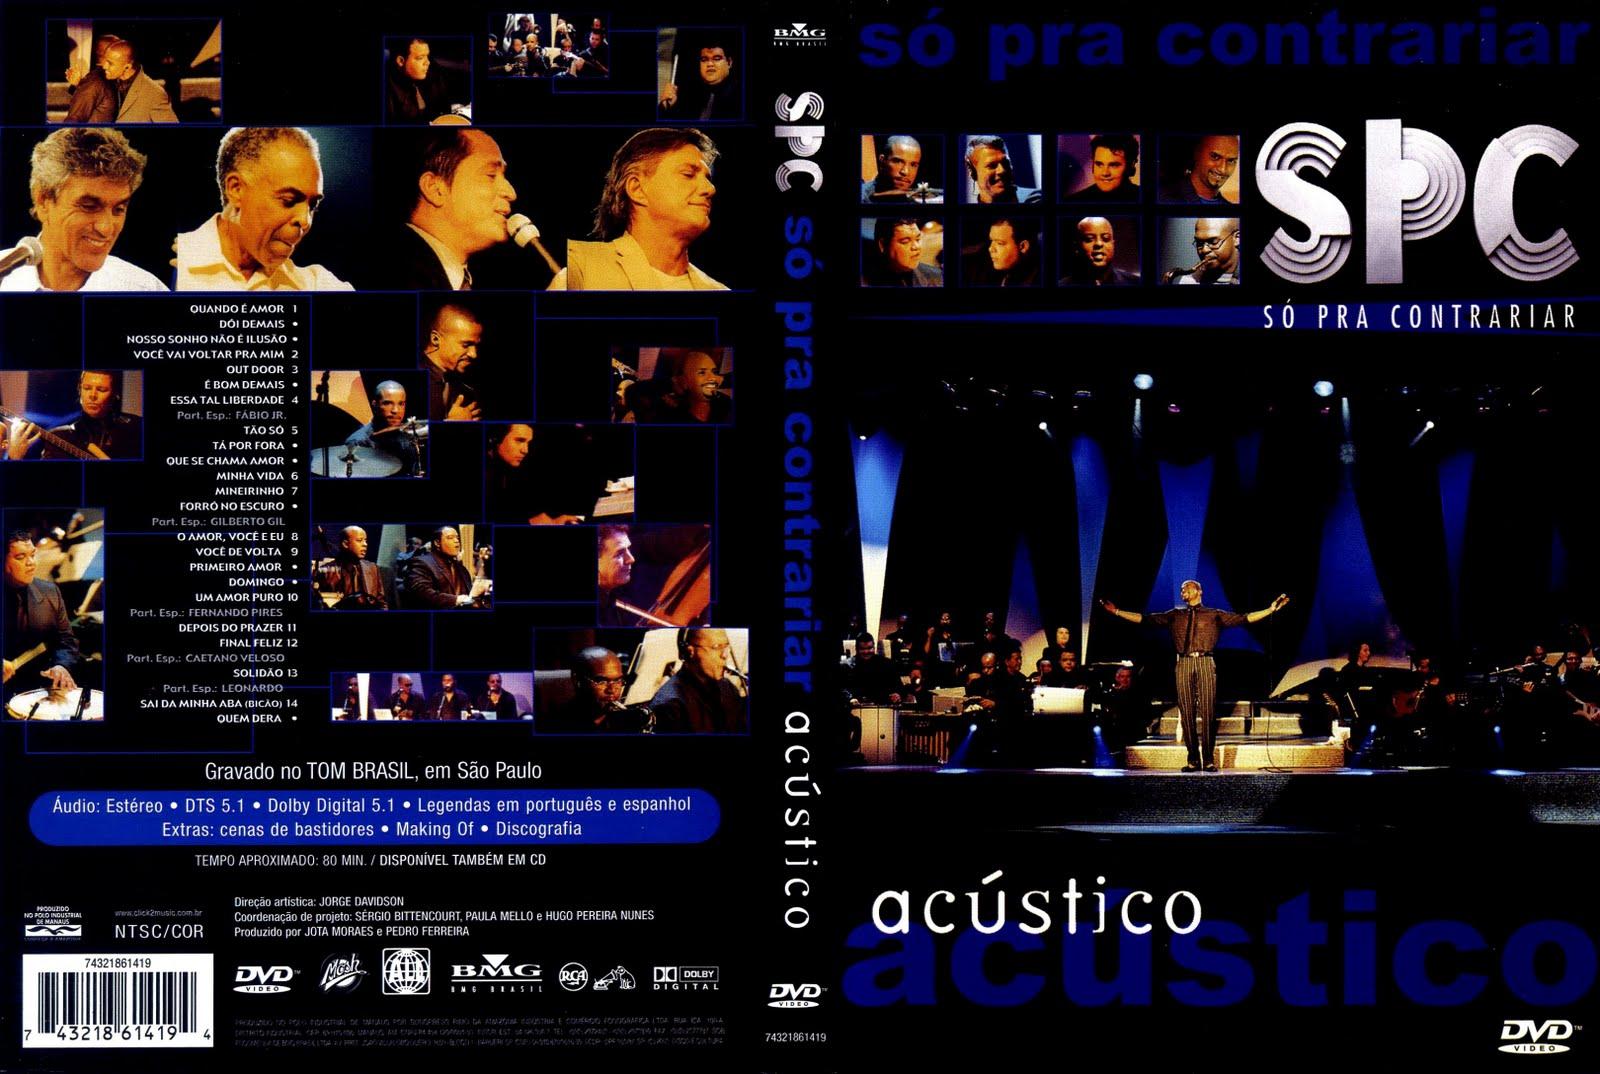 dvd so pra contrariar acustico